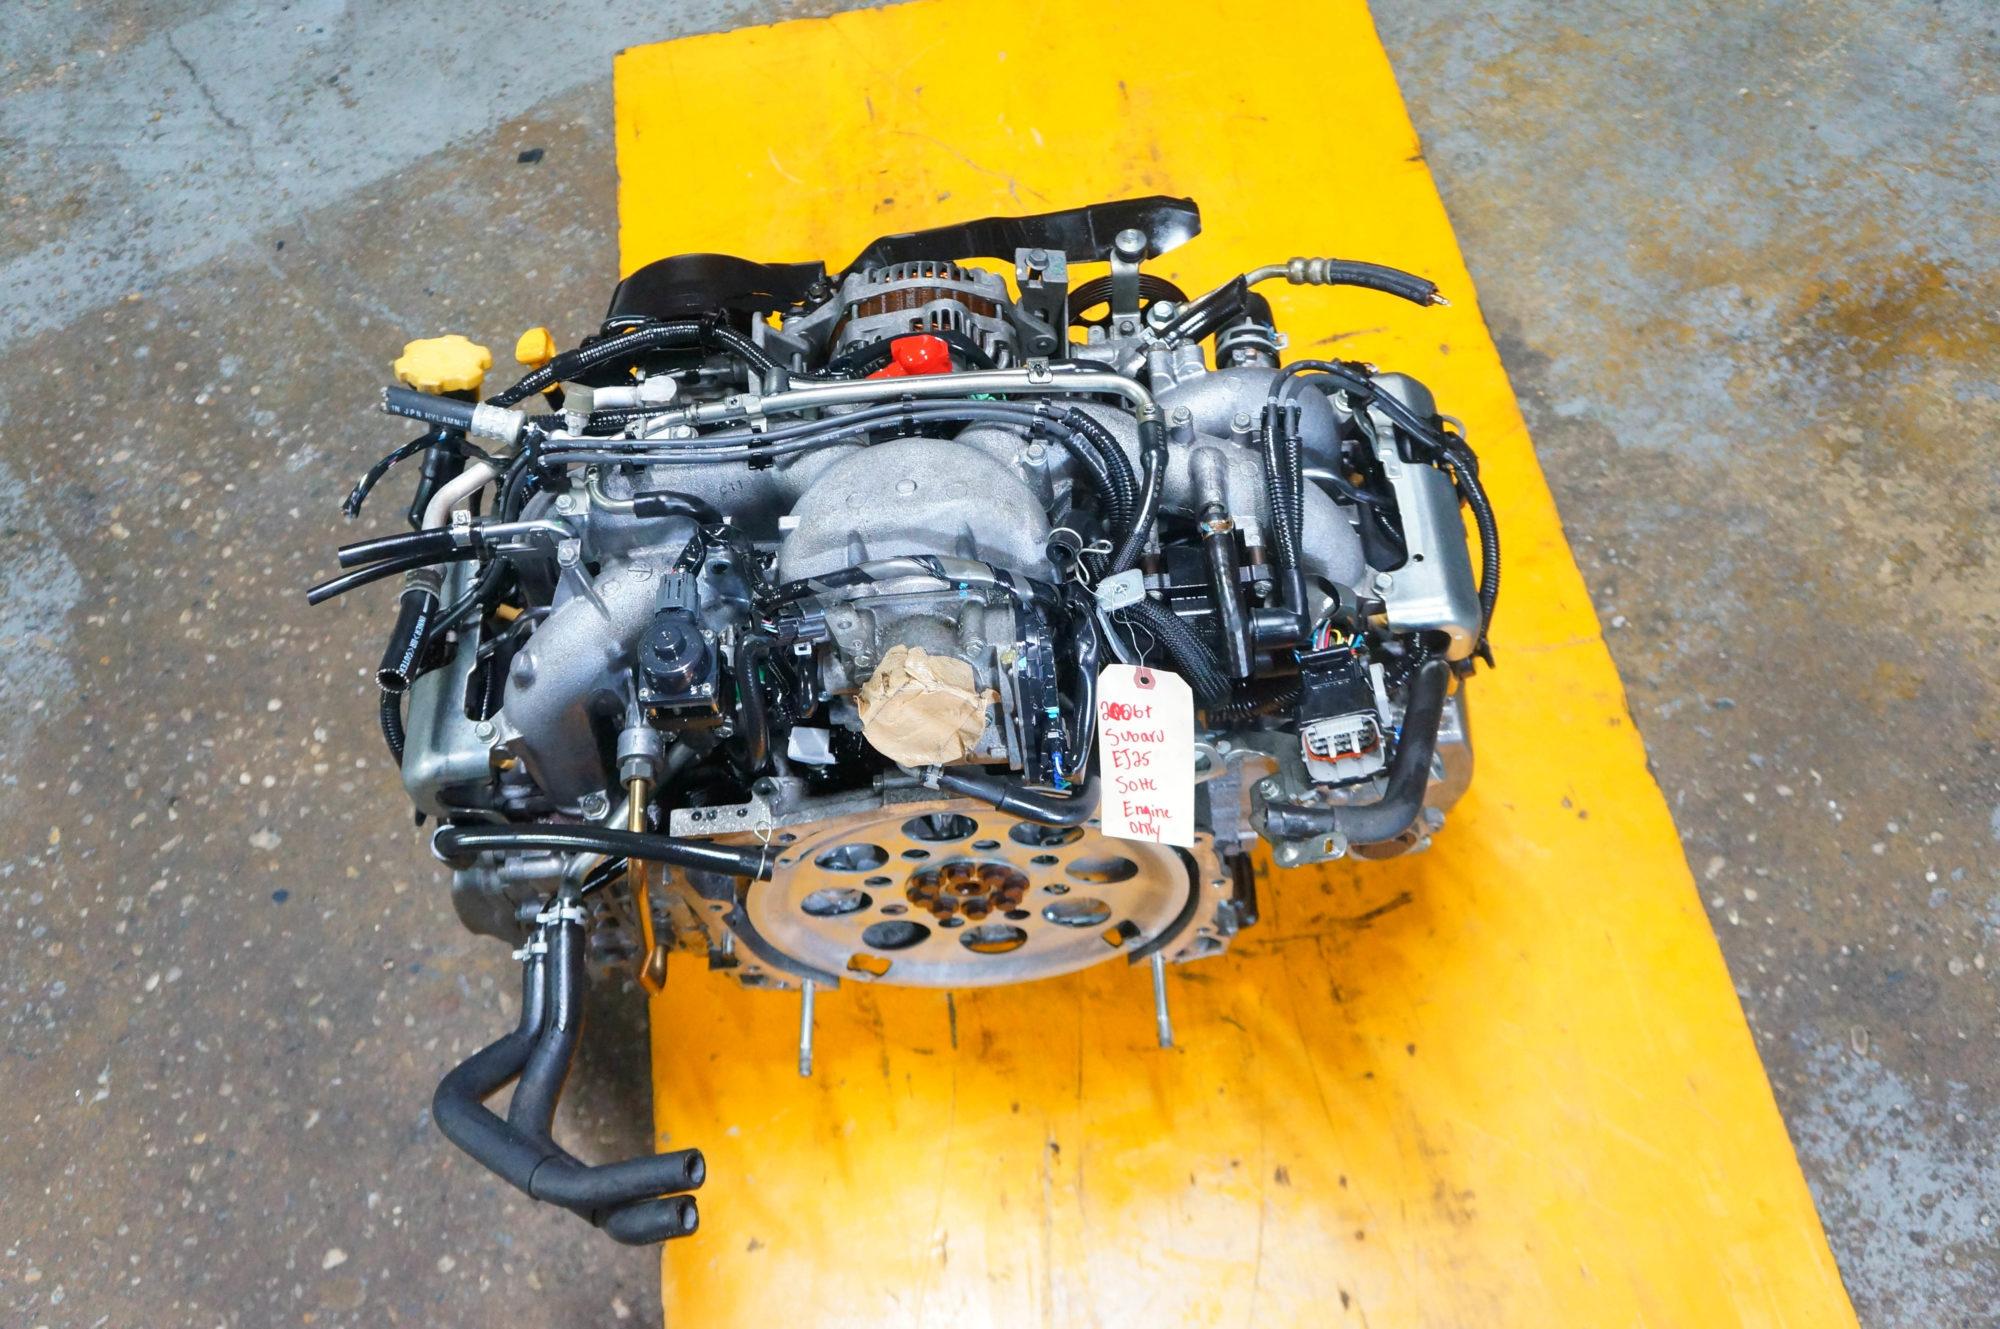 06-09 SUBARU IMPREZA FORESTER LEGACY EJ25 2.5L SOHC ENGINE JDM EJ25